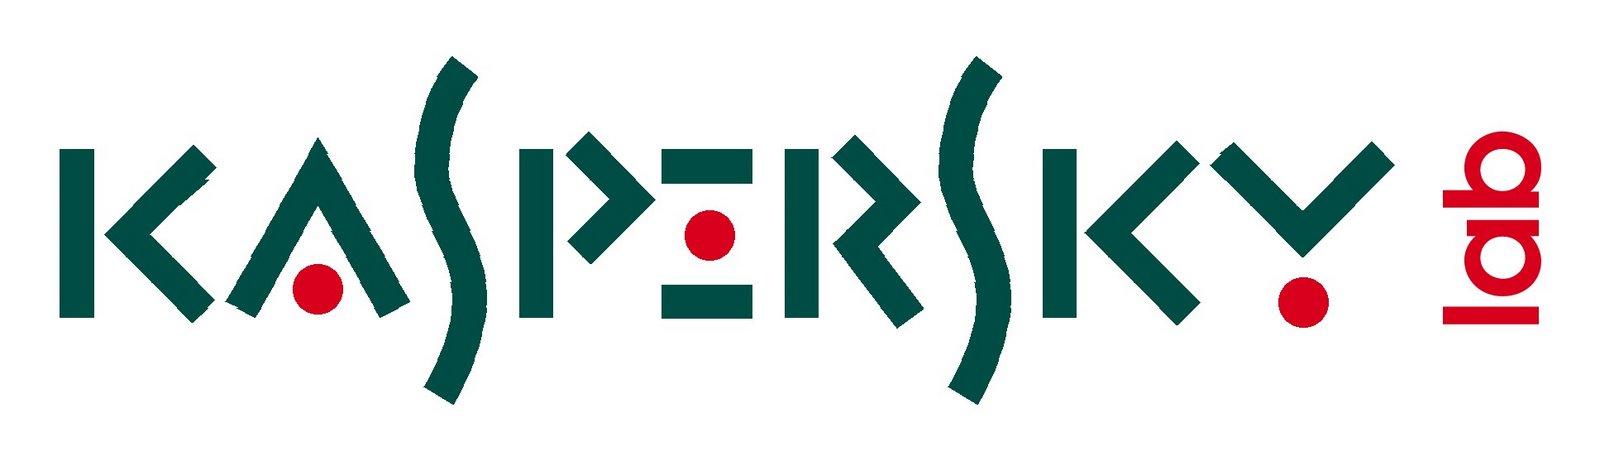 kaspersky-logo-736545